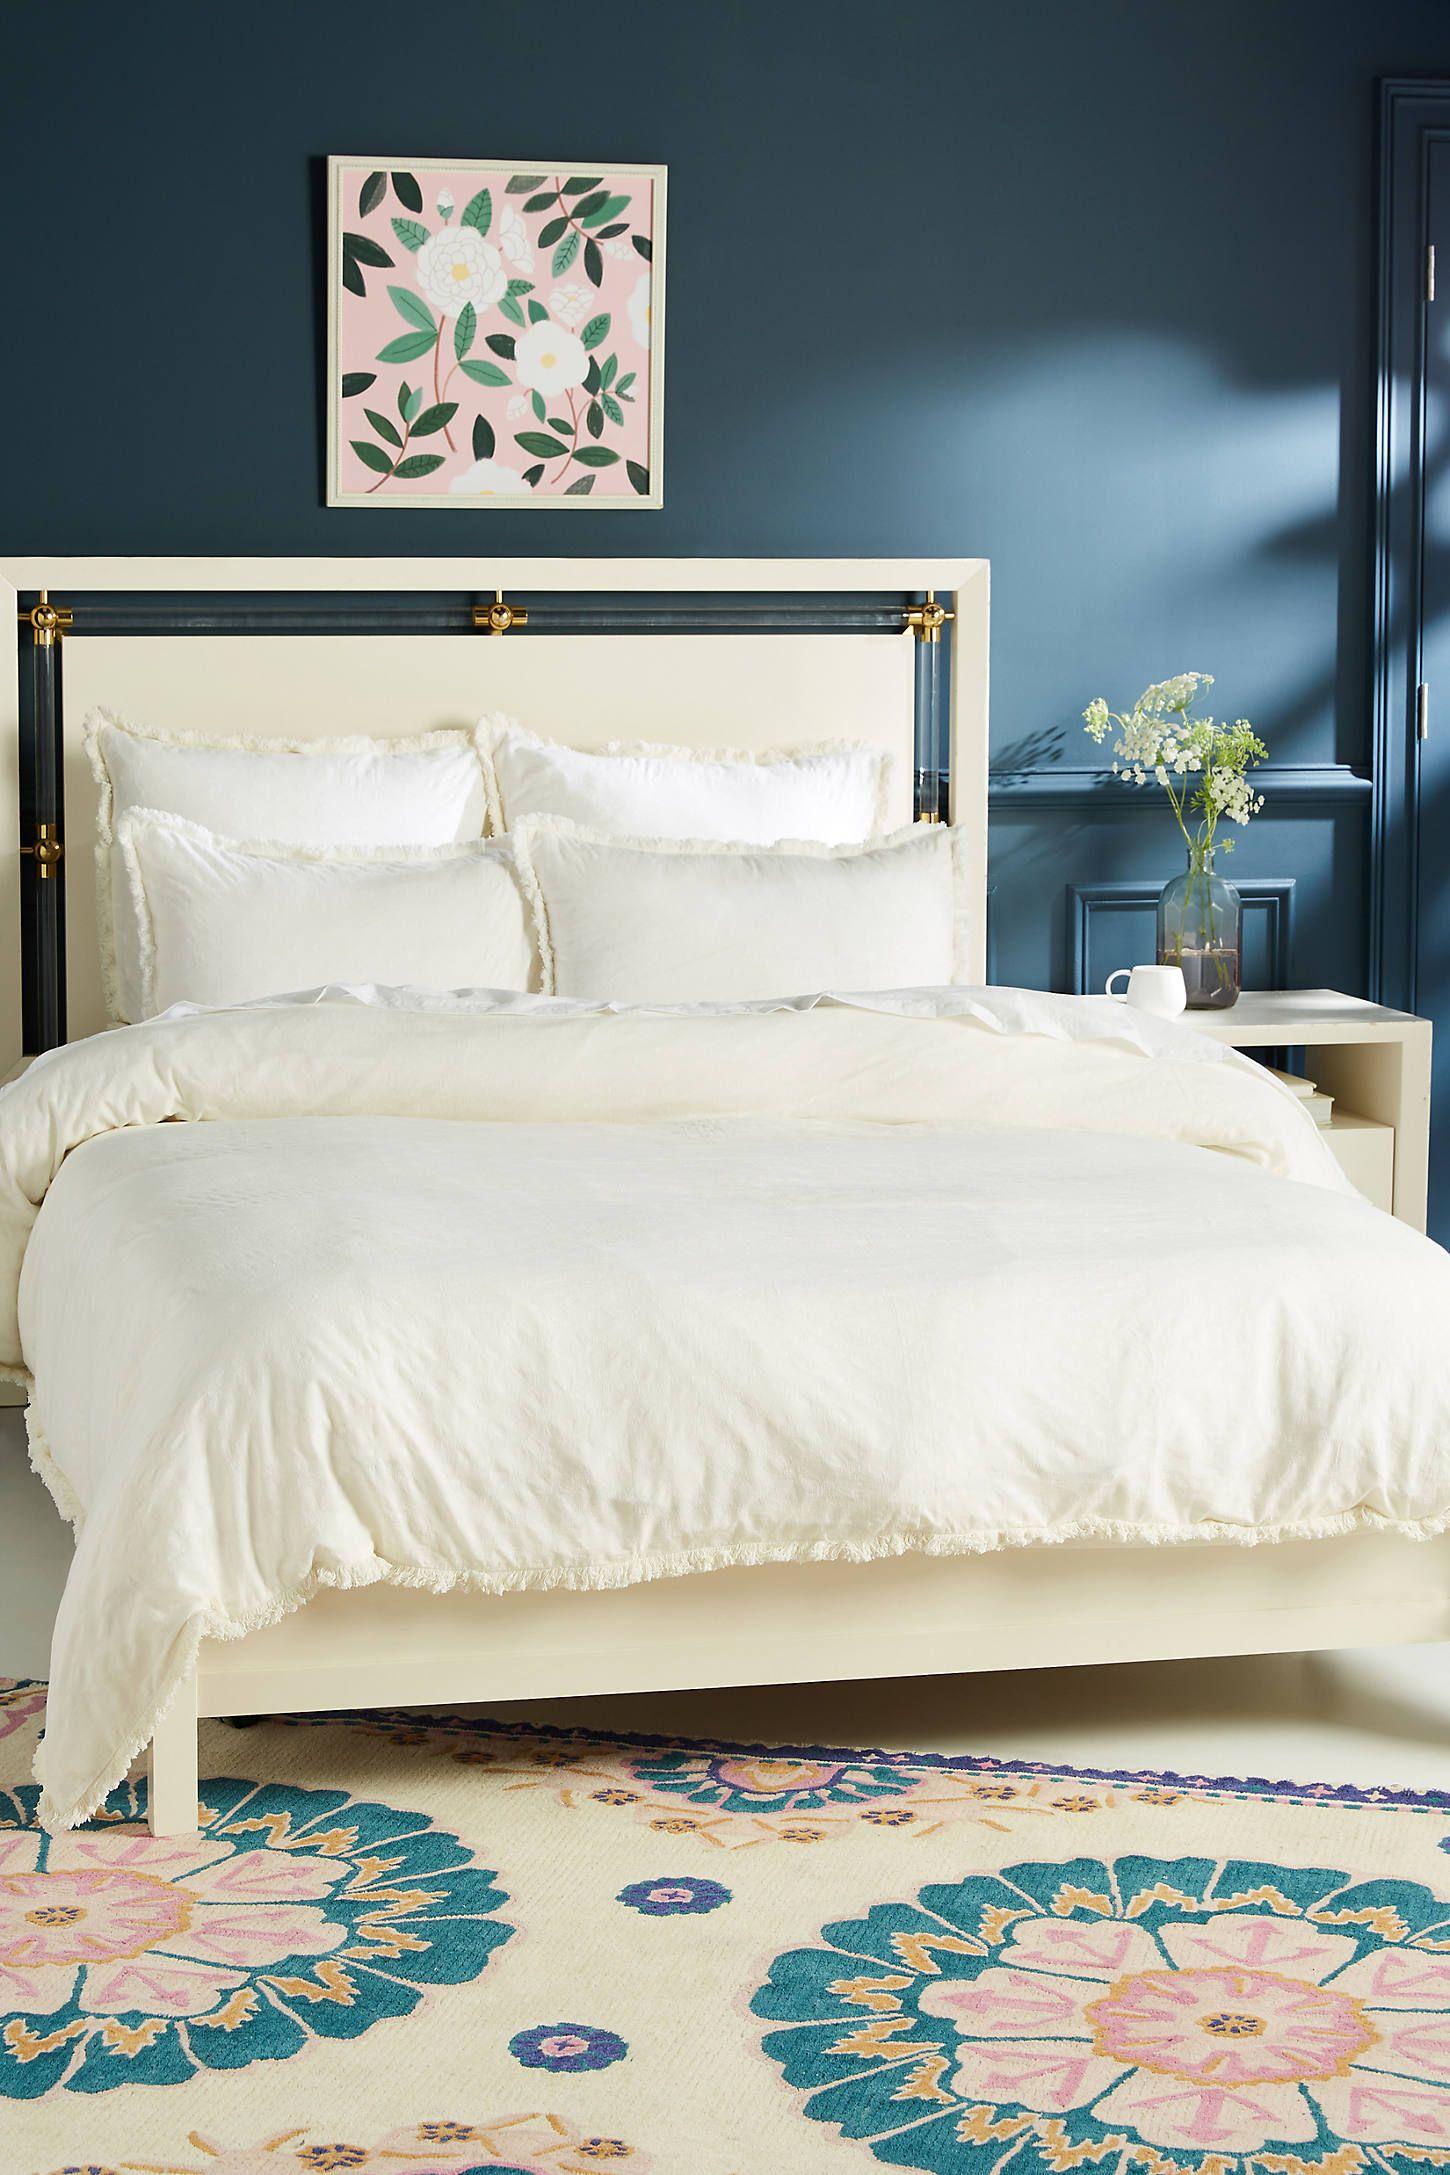 JacquardWoven Imogen Duvet Cover Bed sets for sale